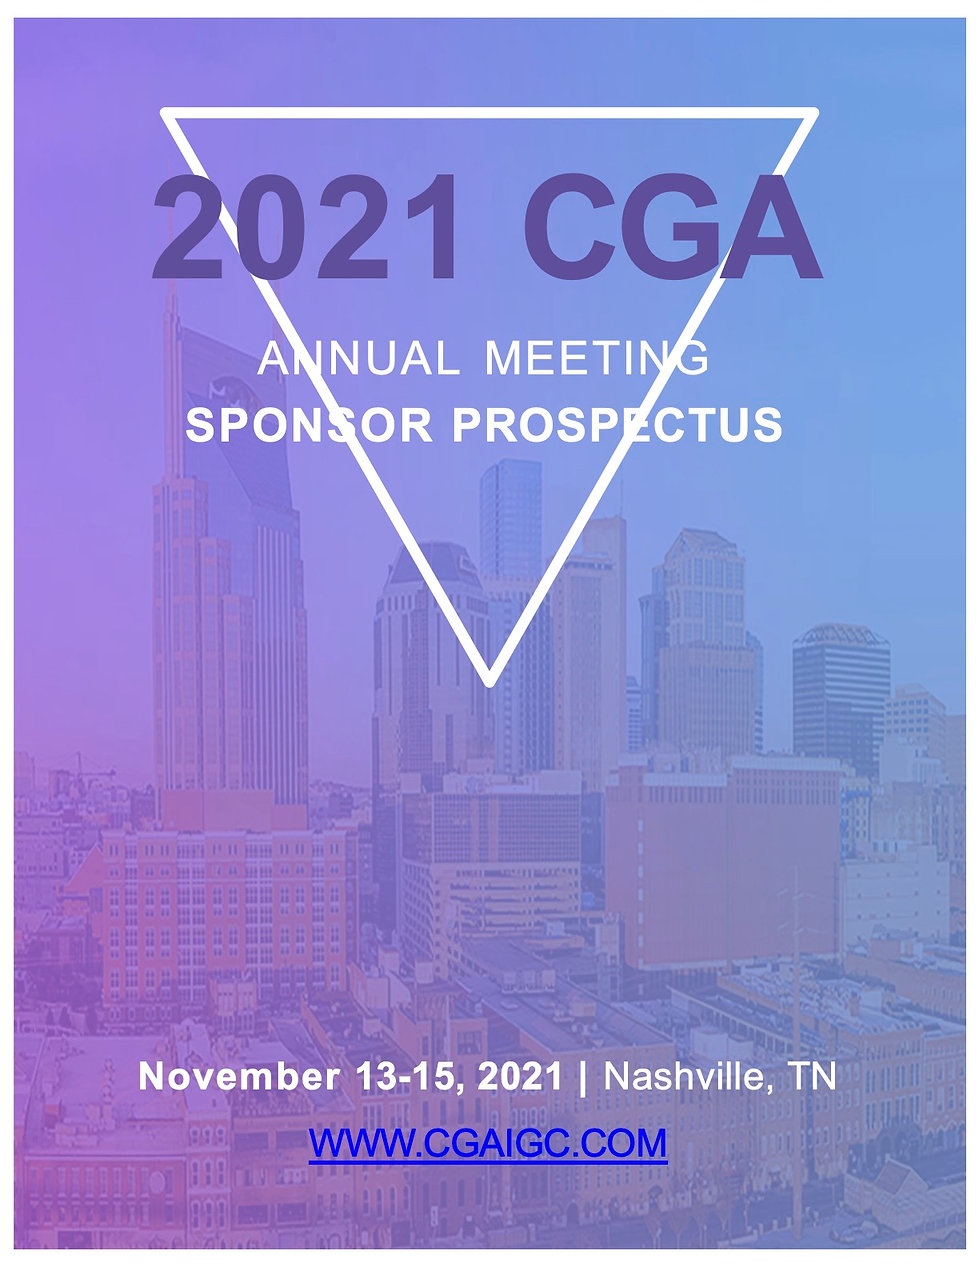 2021 CGA Prospectus_final.jpg